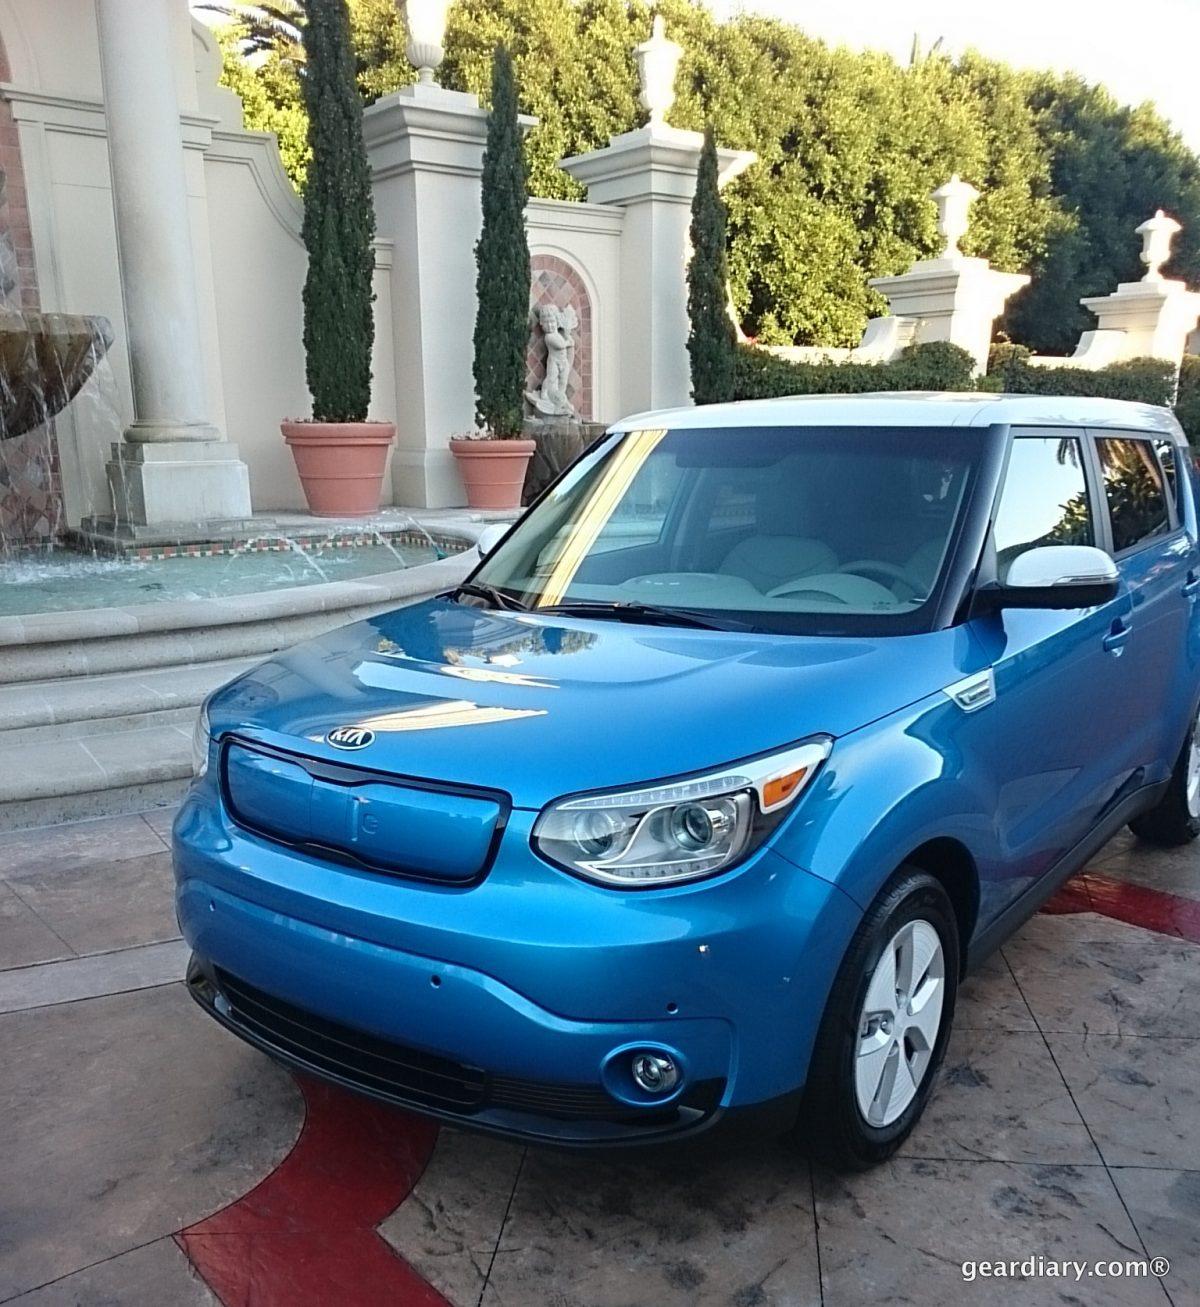 Gear Diary 2015 Kia Soul EV Electric Vehicle Eco.26?ssl=1 2015 kia soul ev 100 miles of electric vehicle style \u2022 geardiary  at readyjetset.co